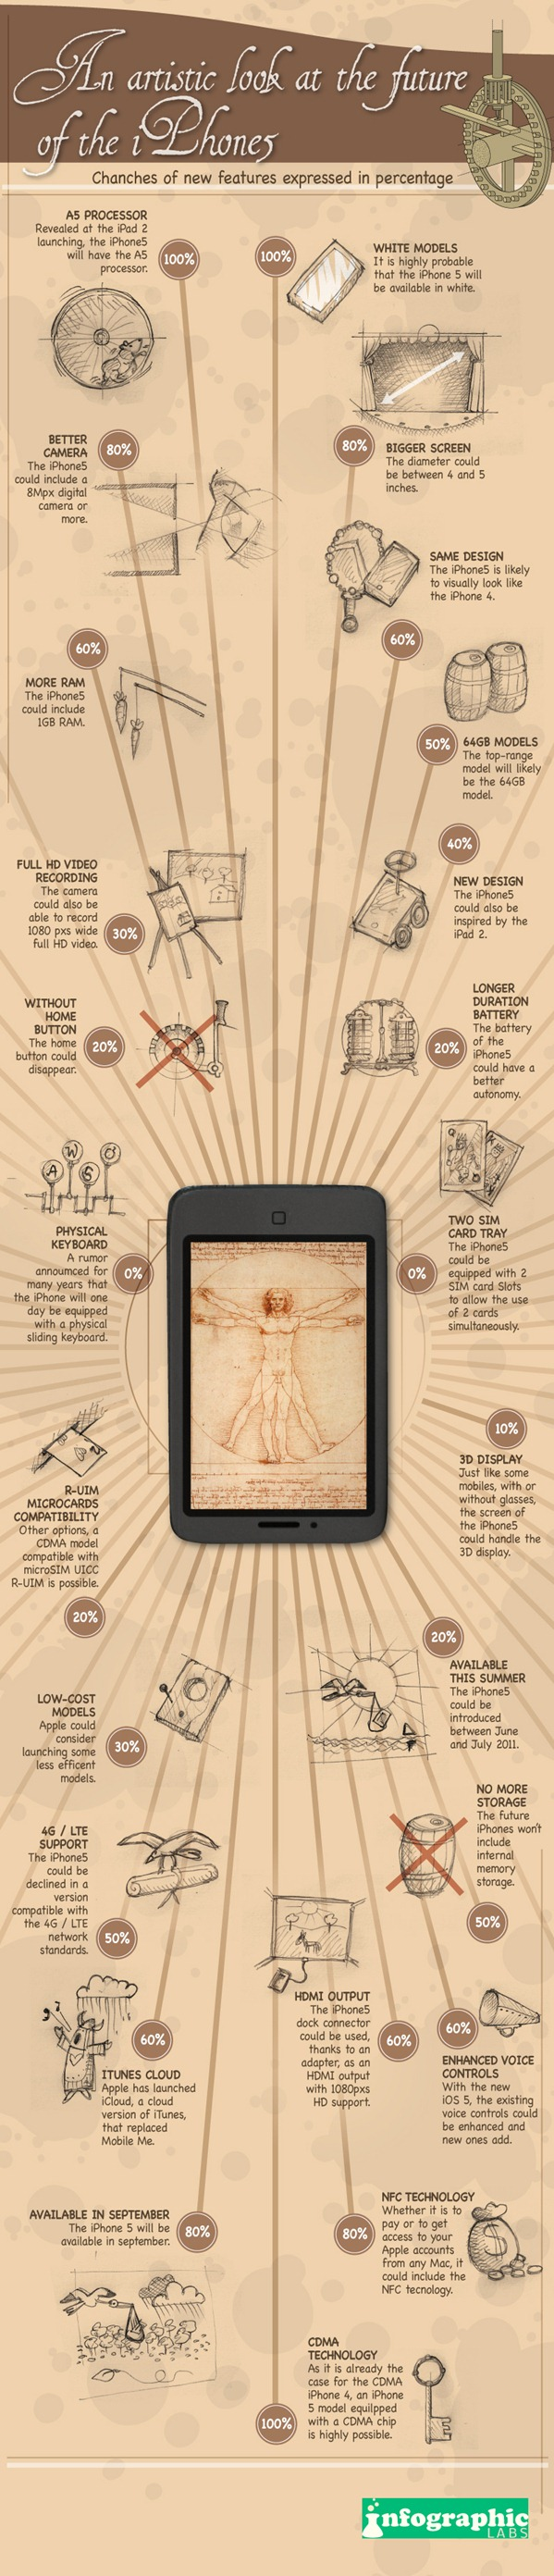 iPhone 5 rumors infographic